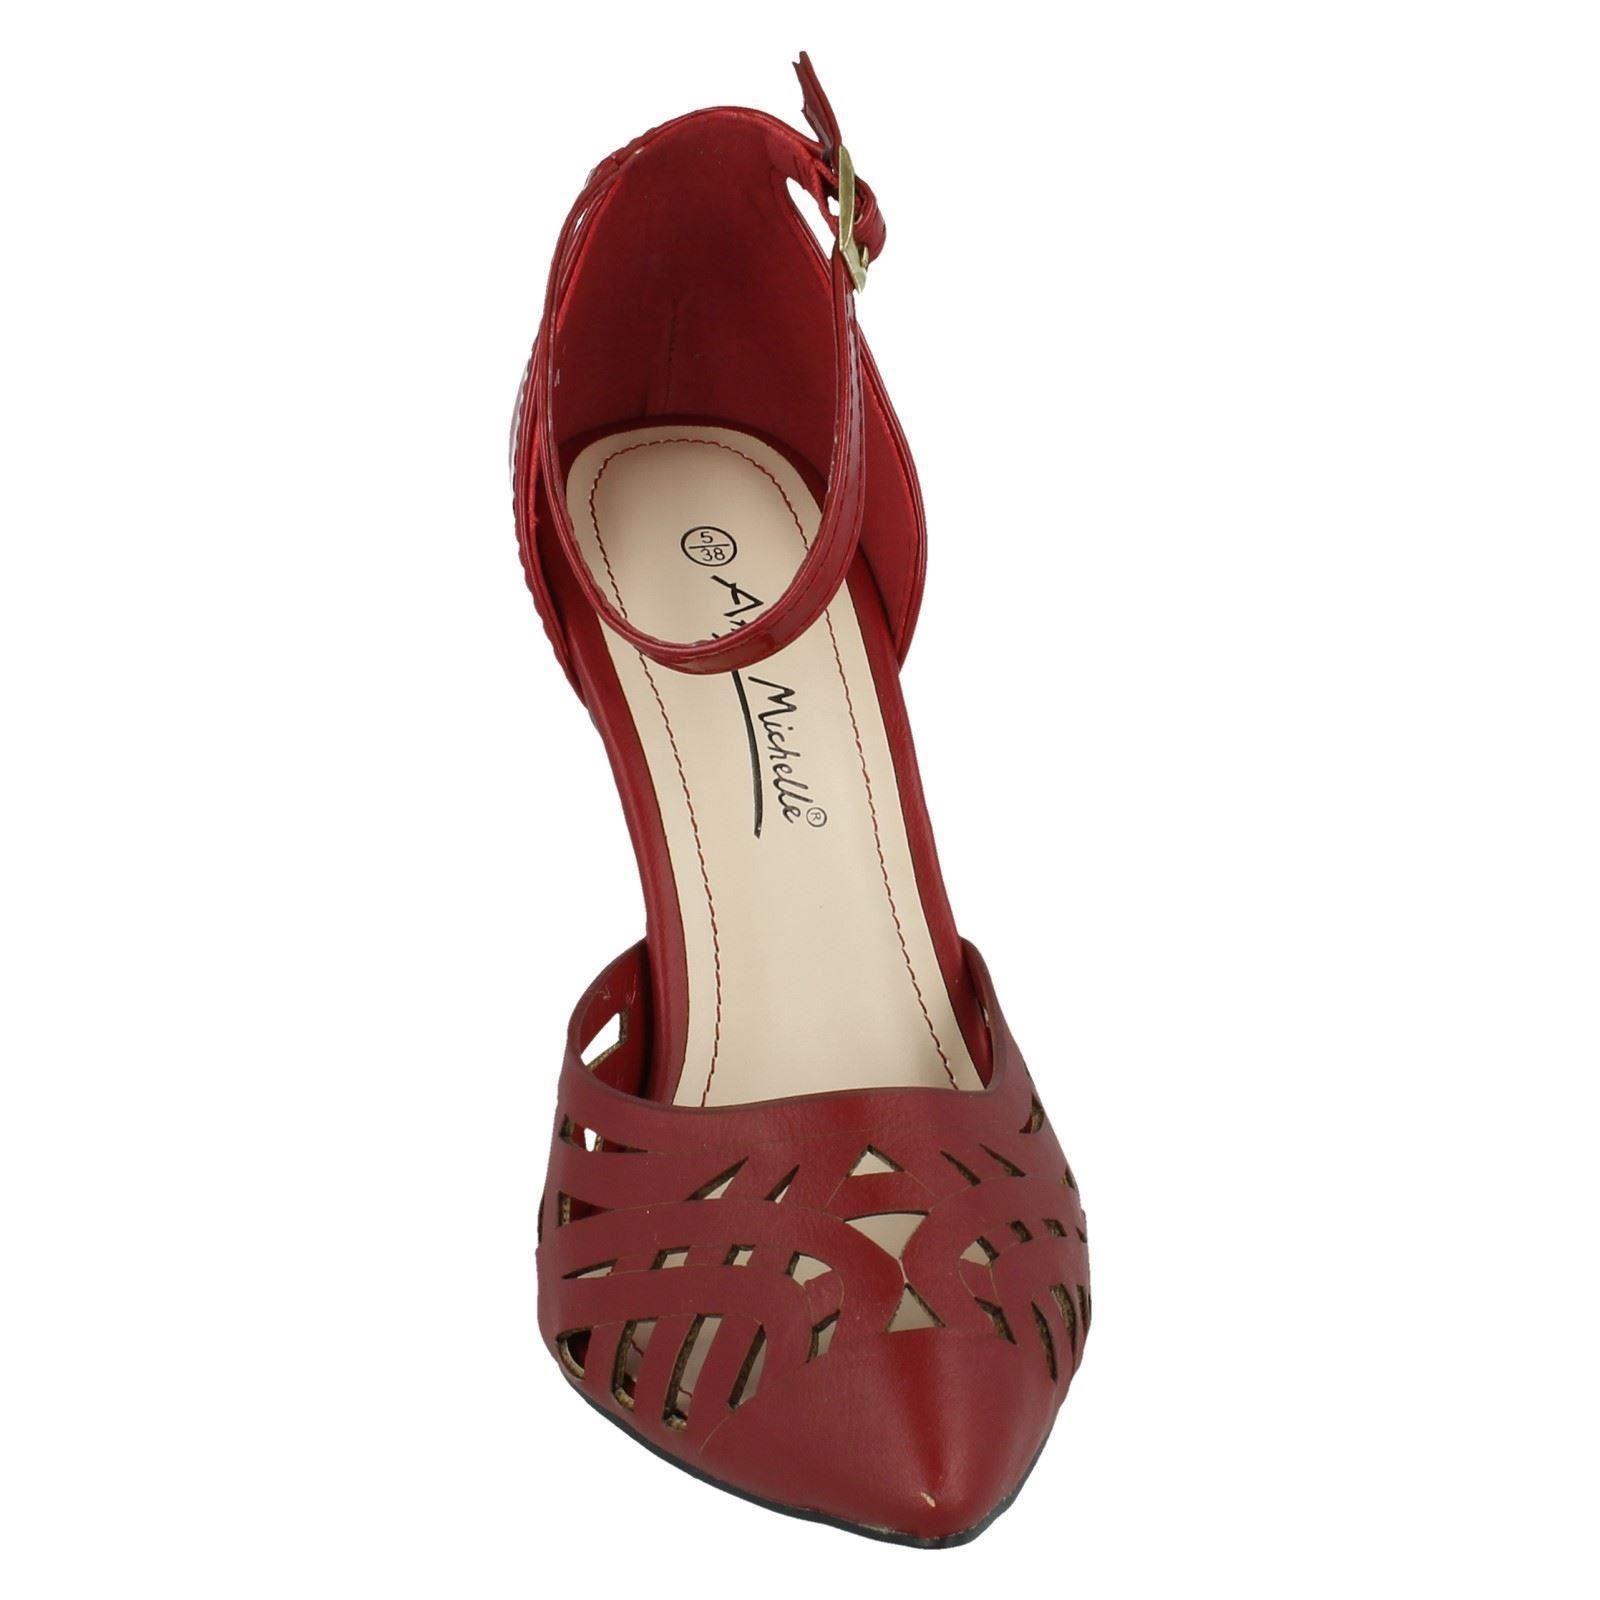 Señoras Anne Michelle correa de tobillo Zapatos Estilo-l2281